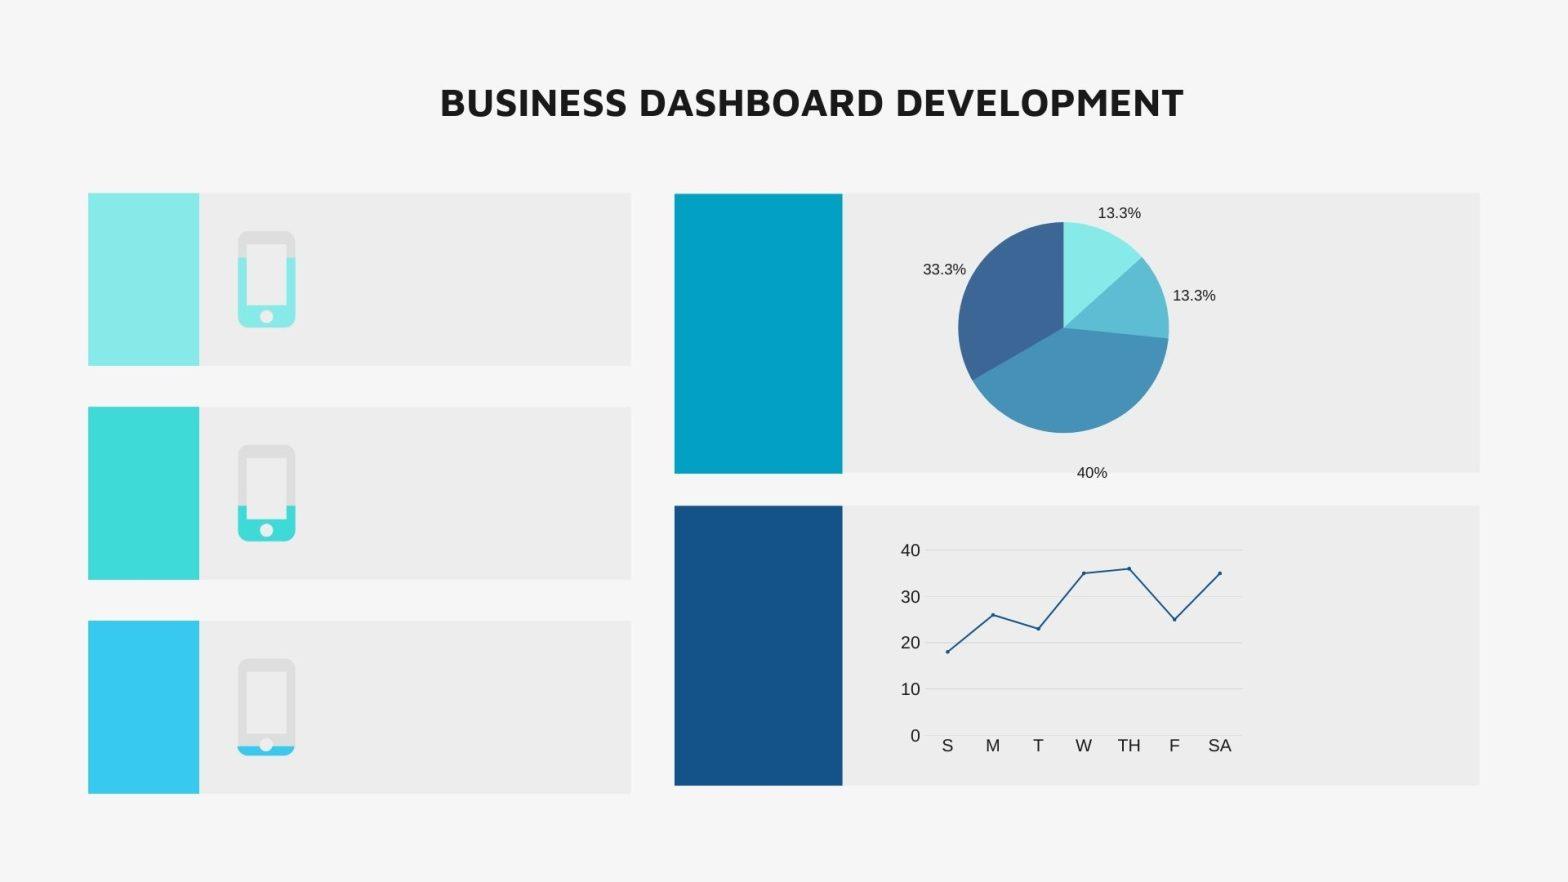 Business Dashboard Development